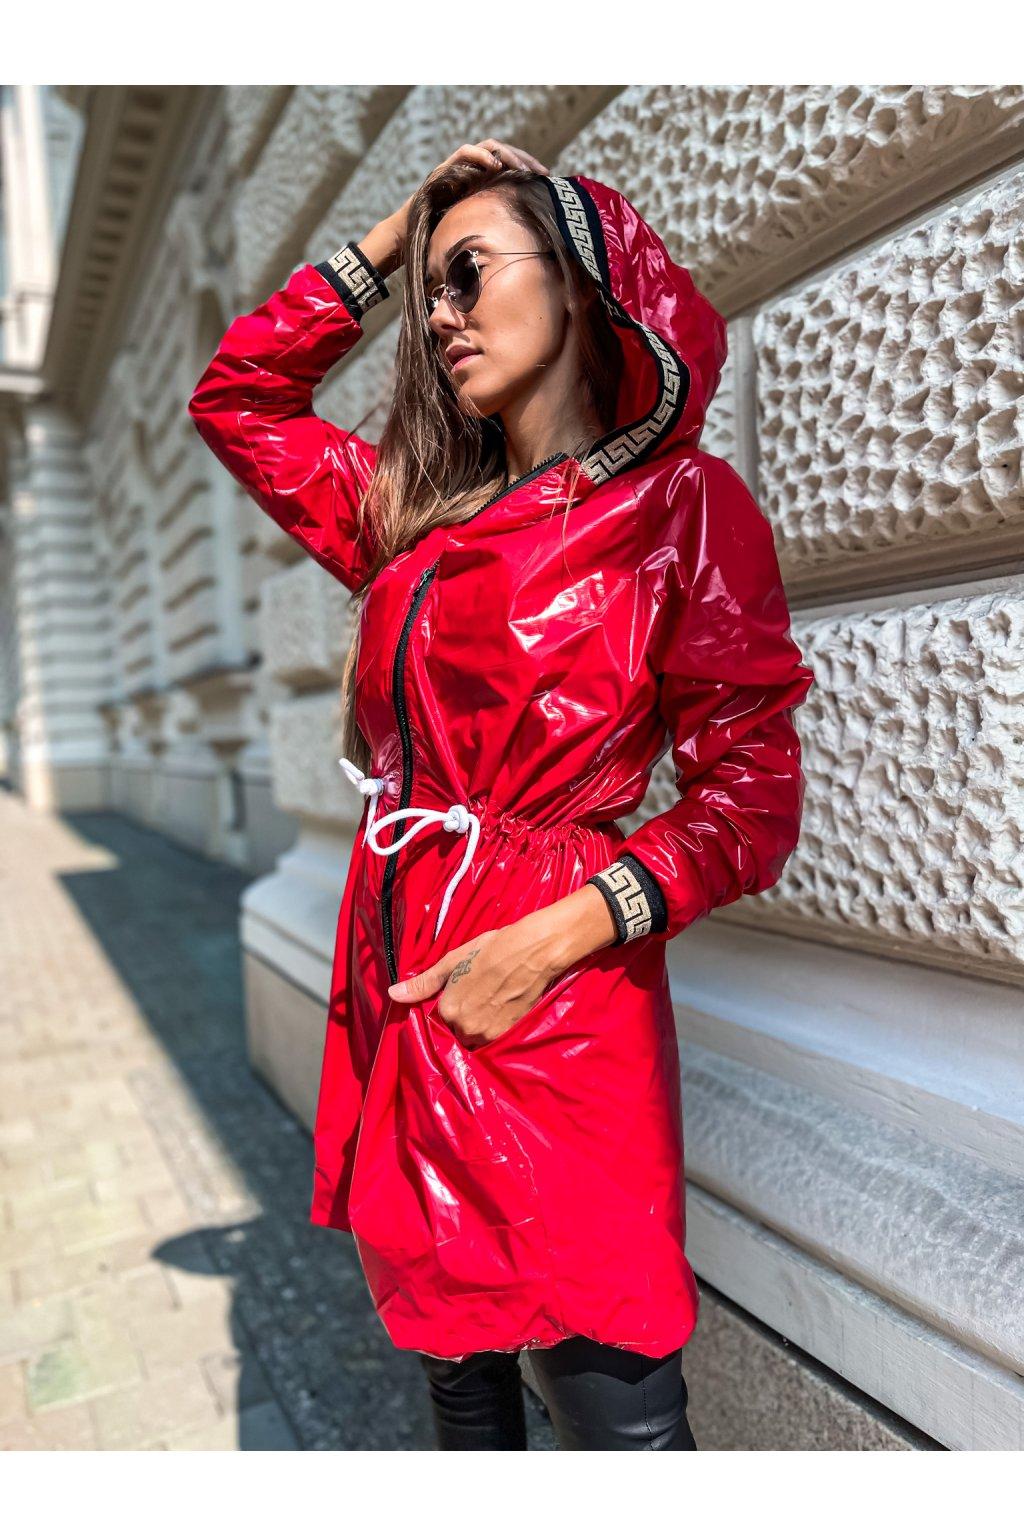 damska prodlouzena bunda verra red eshopat cz 1